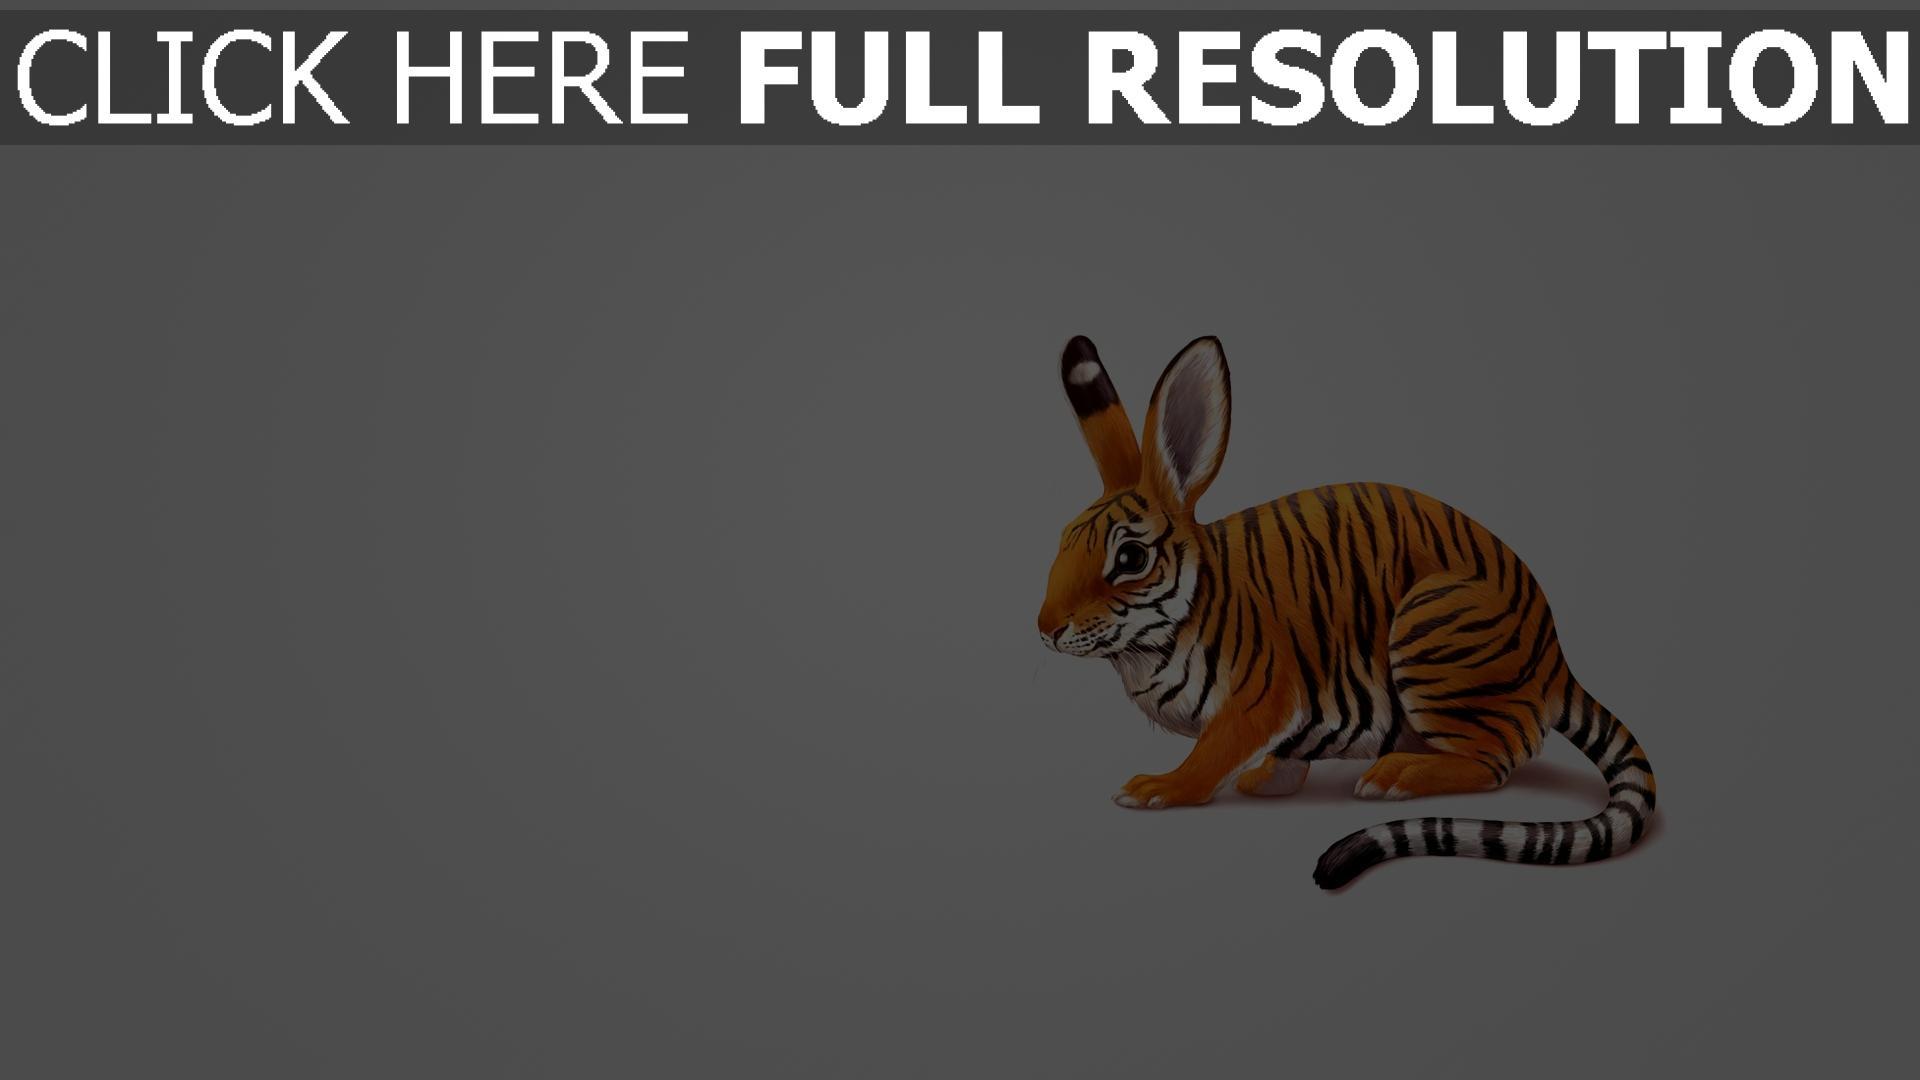 fond d'écran 1920x1080 hybride tigre lapin amusant